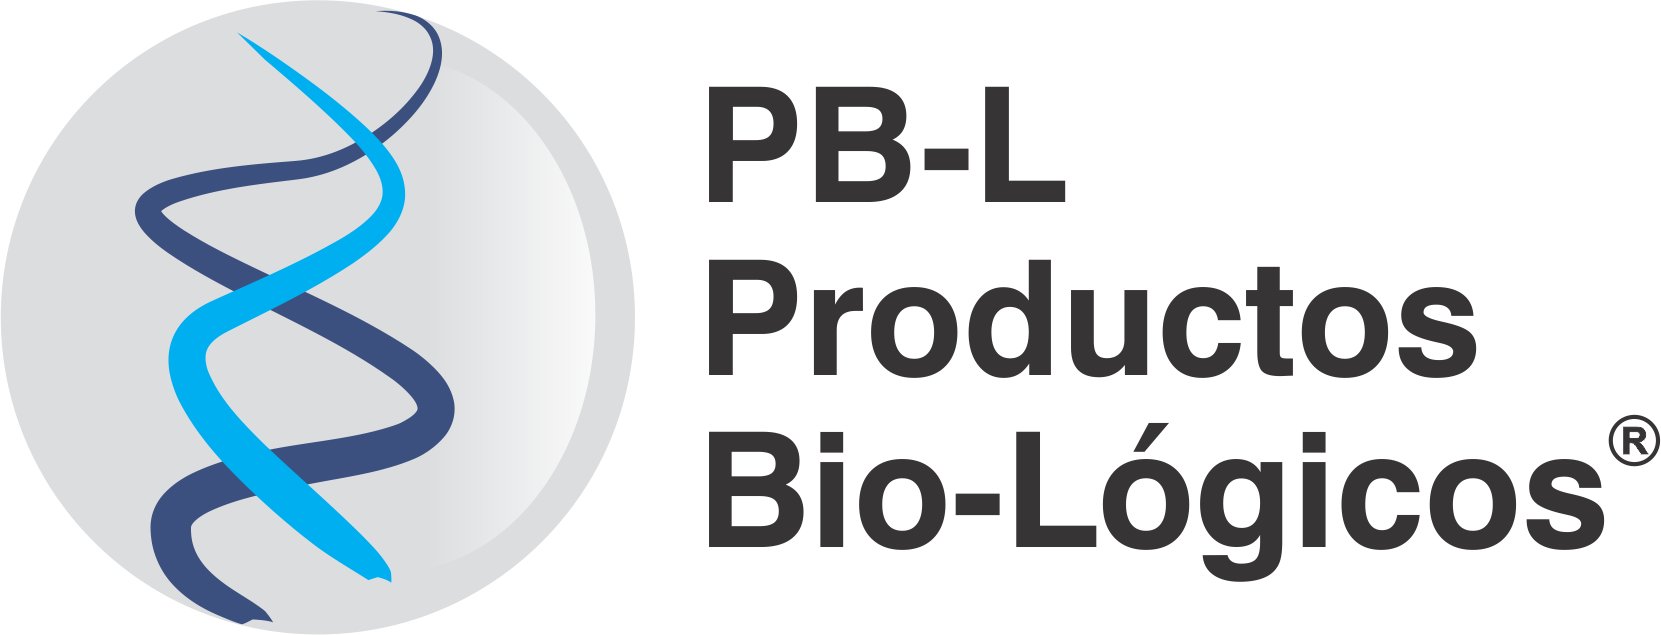 PB-L Productos Bio-lógicos